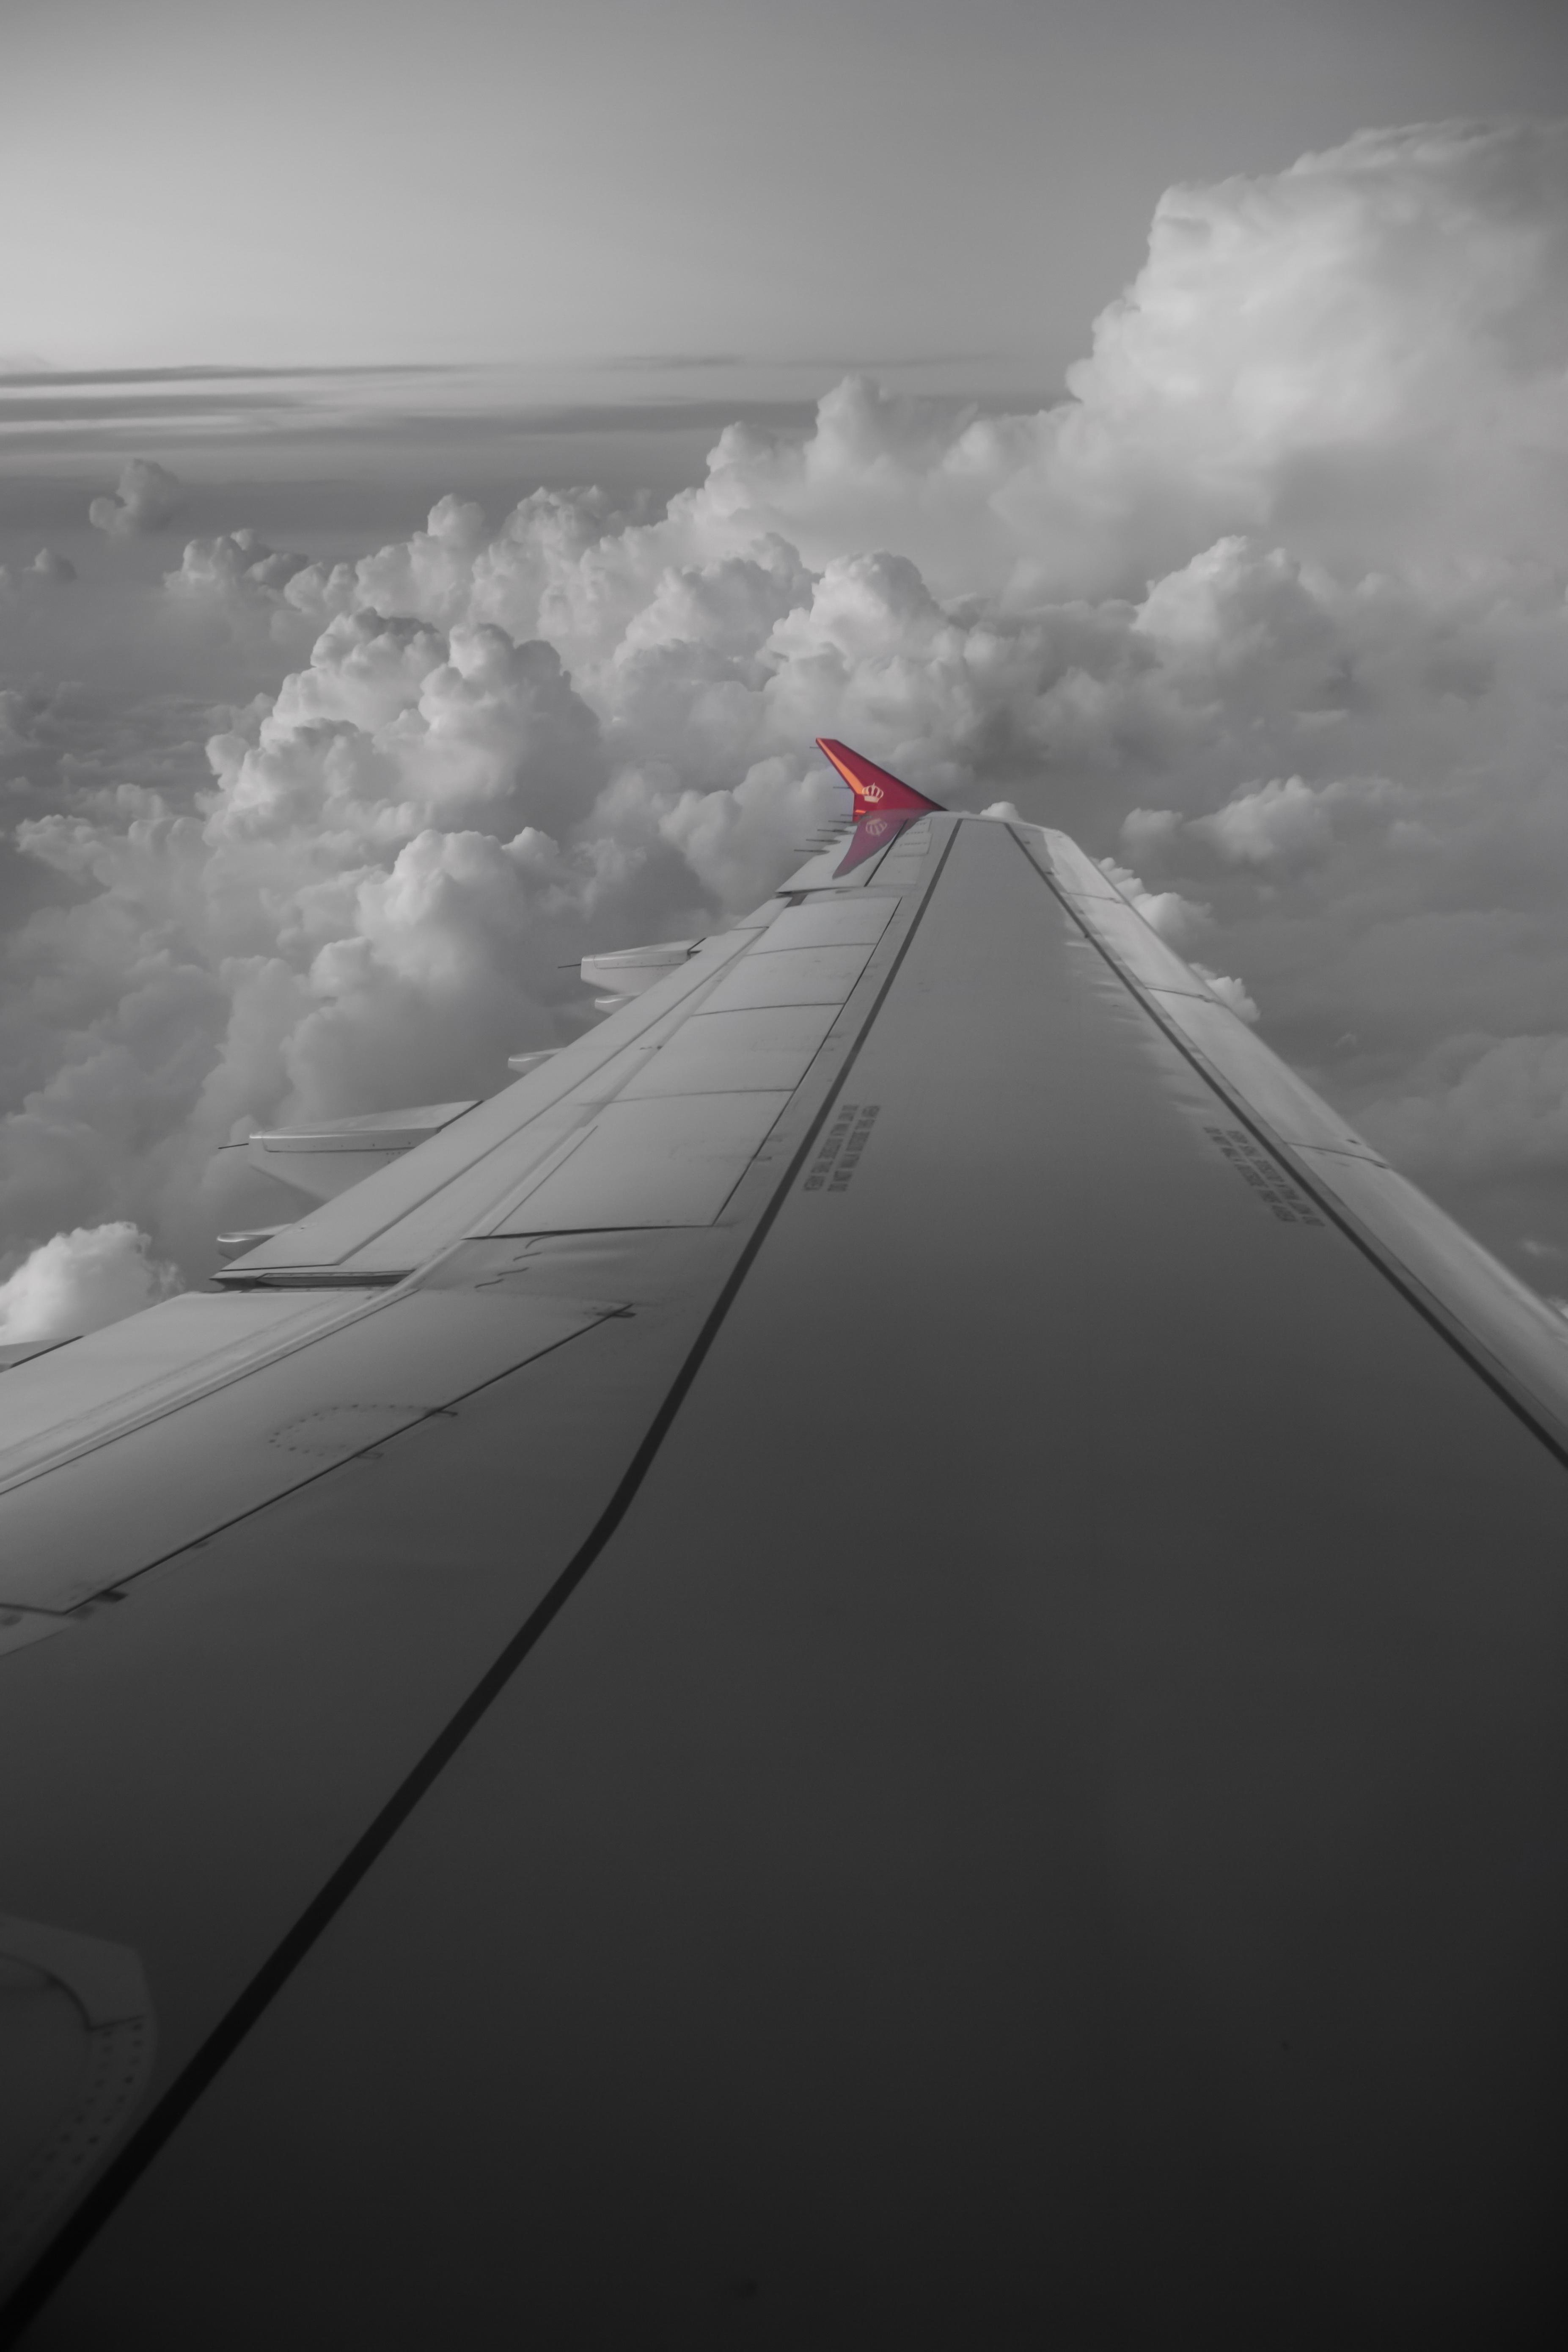 Royal Jordanian Flight